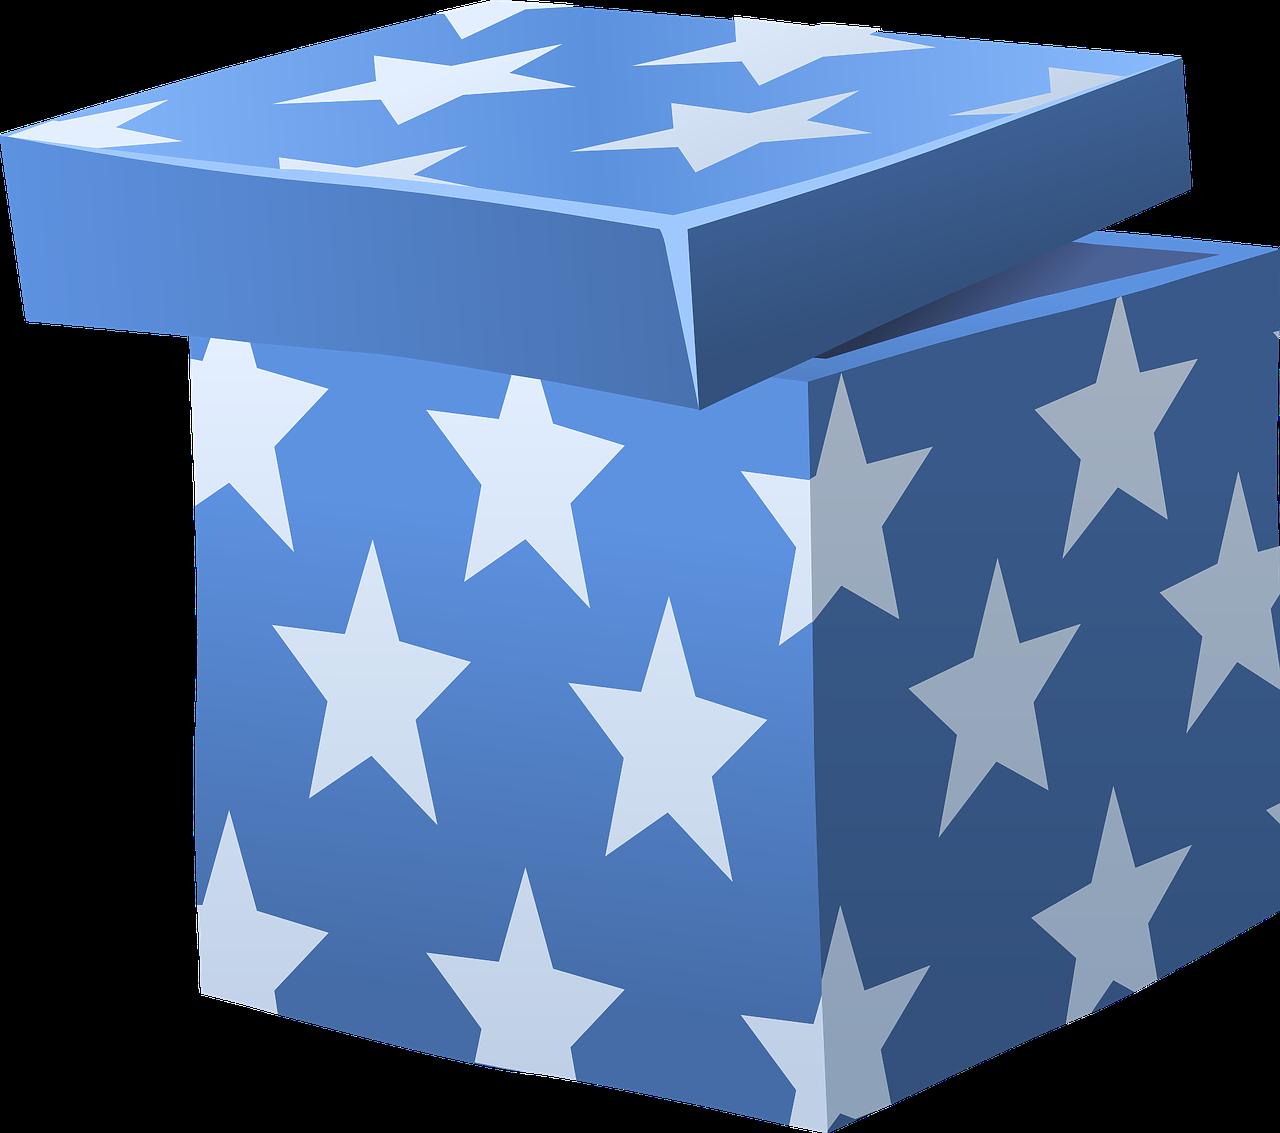 синяя коробка картинка